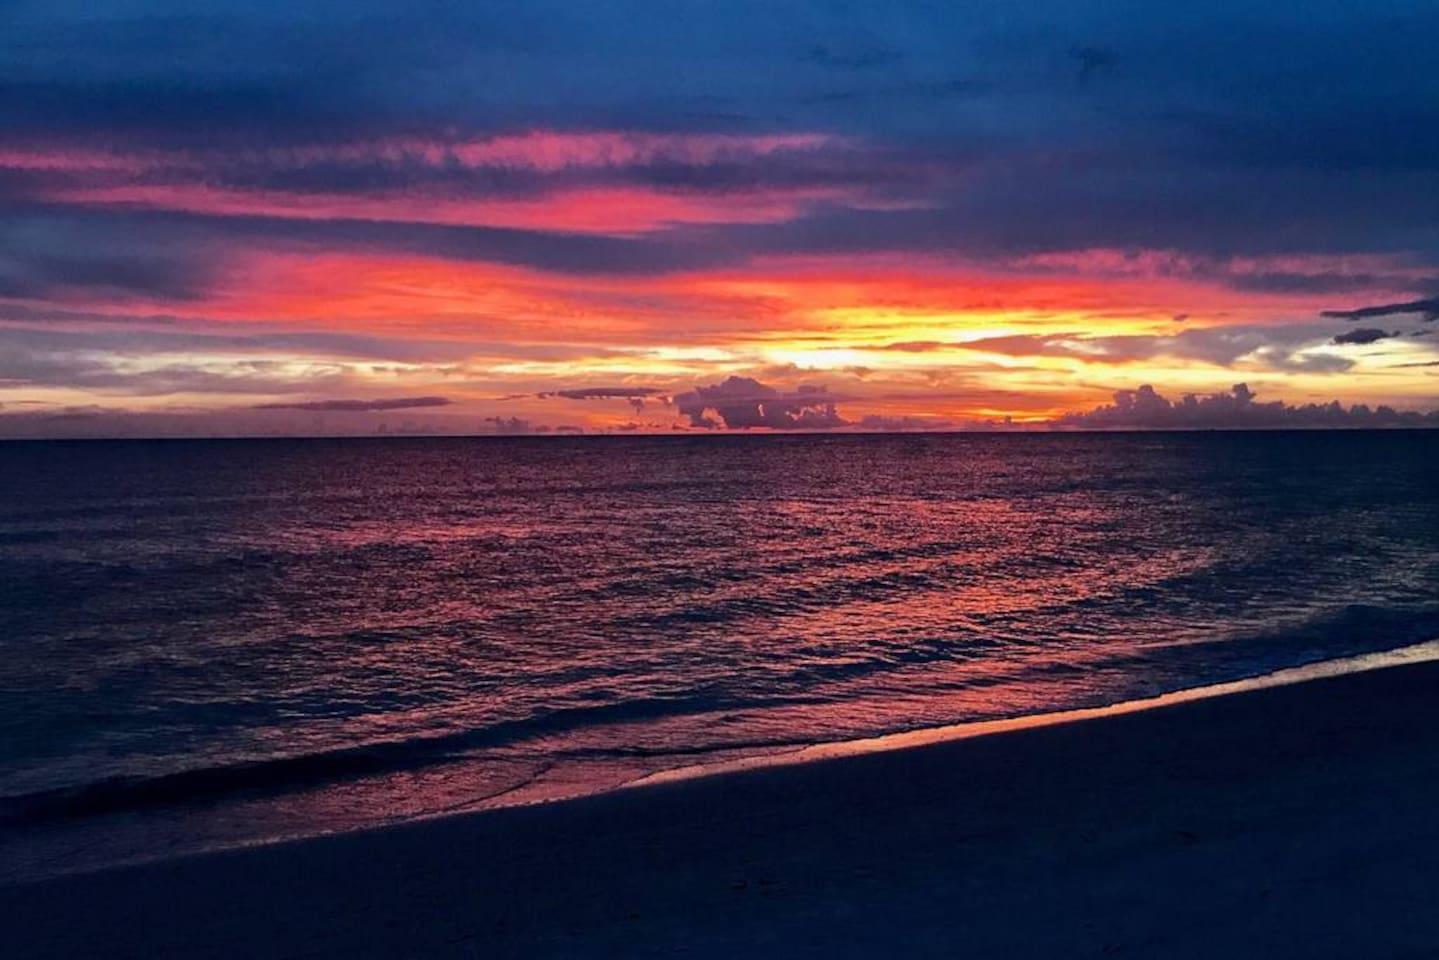 Stunning Sunsets at St Pete Beach